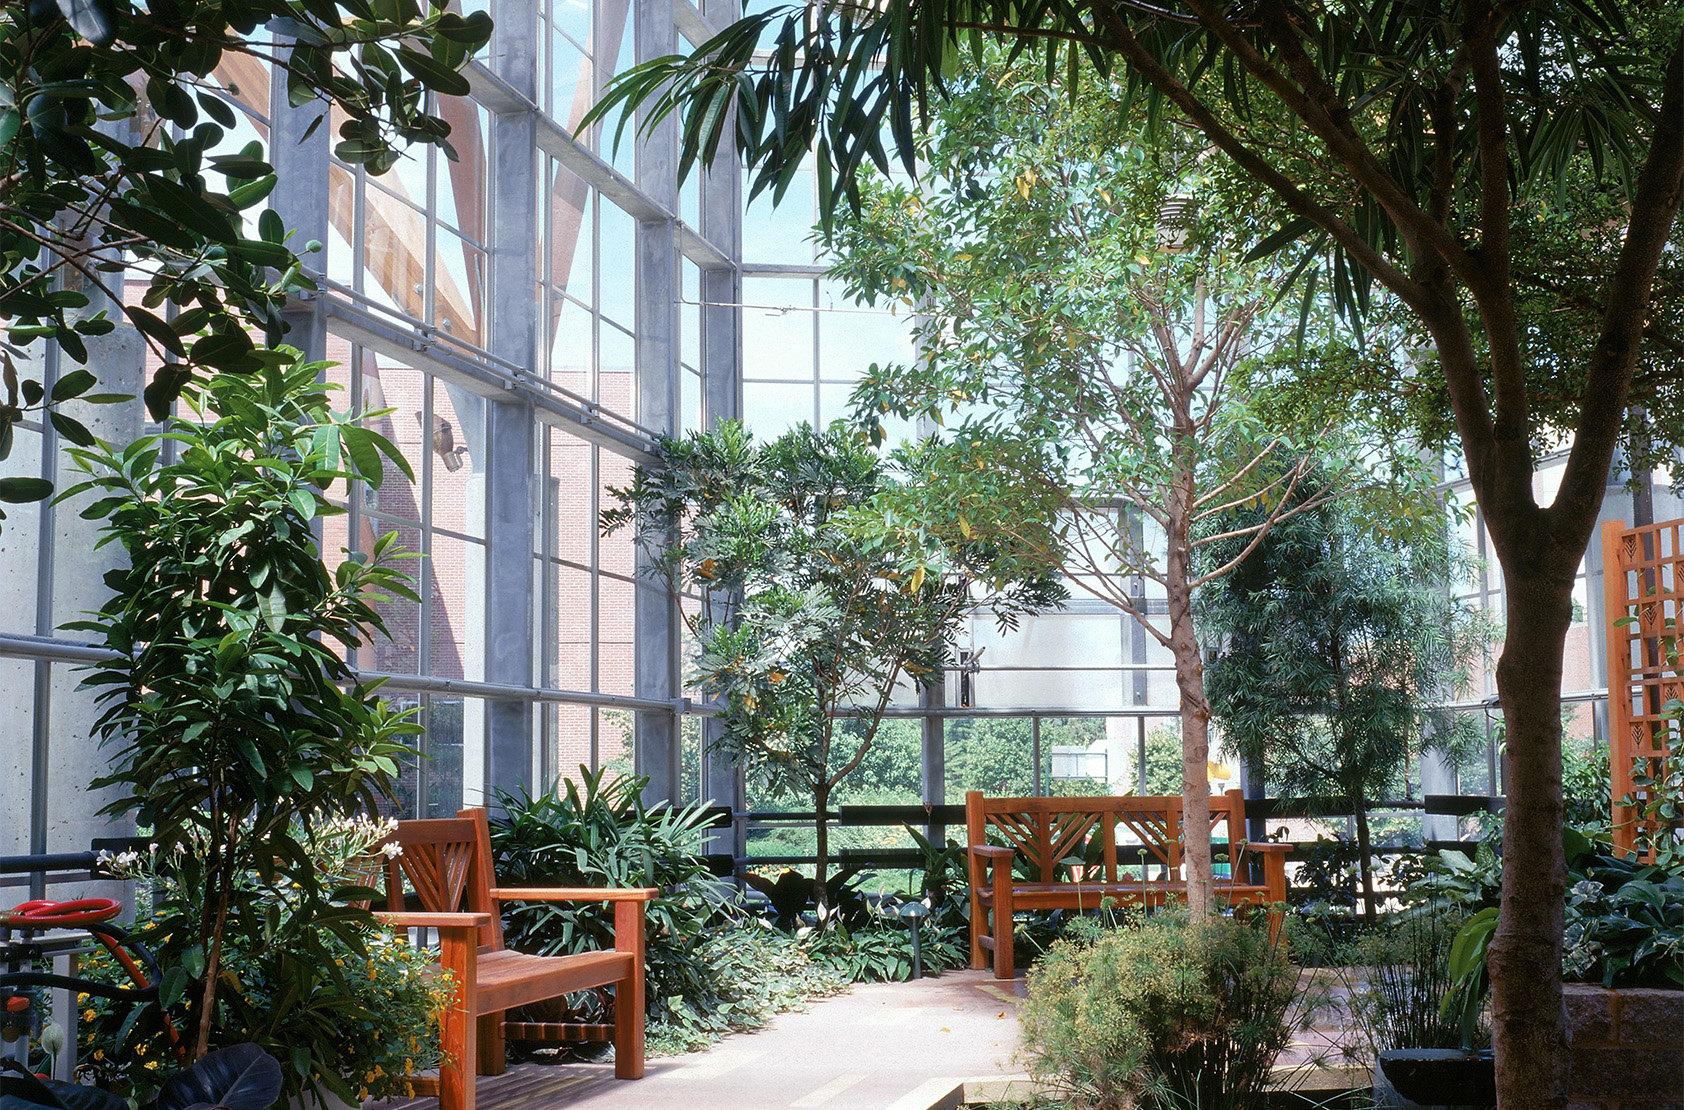 University of Wisconsin - Madison - D.C. Smith Greenhouses